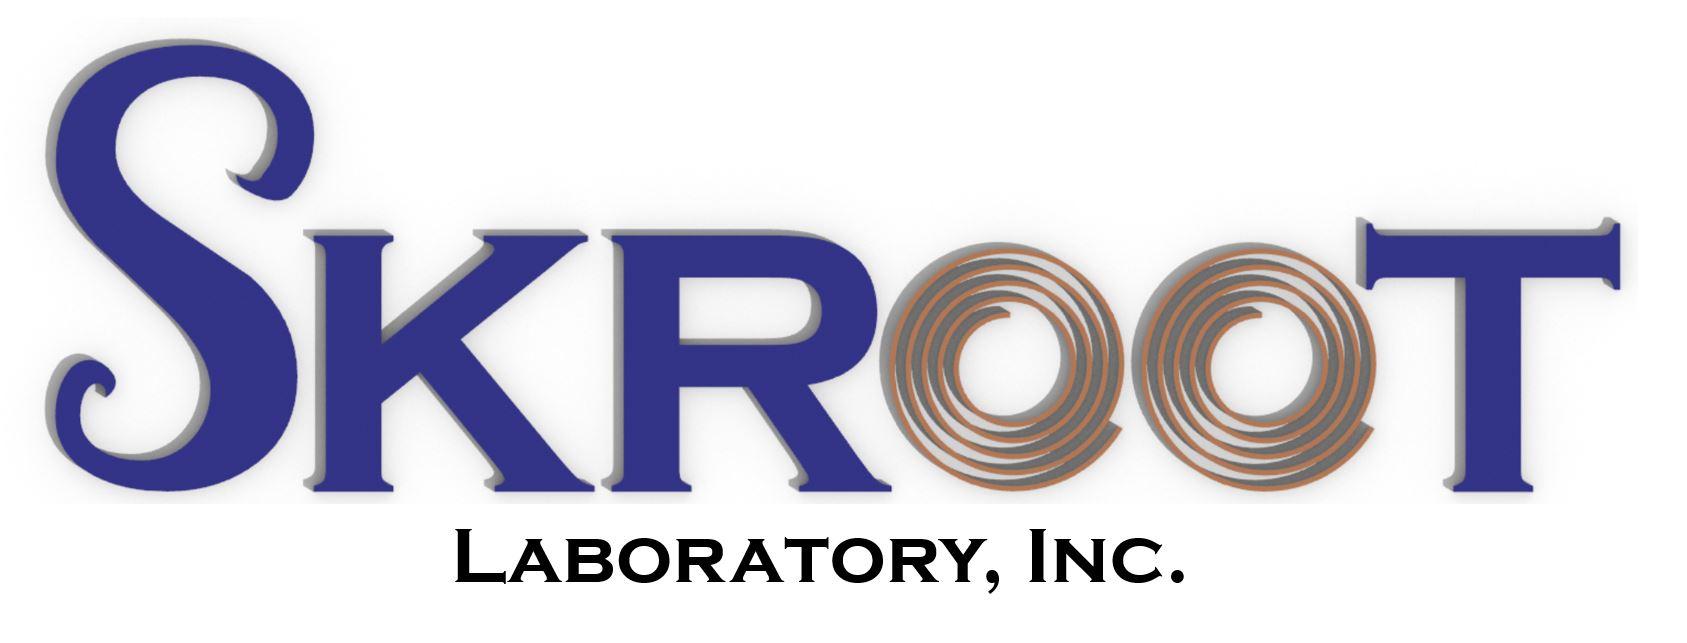 Skroot_Logo